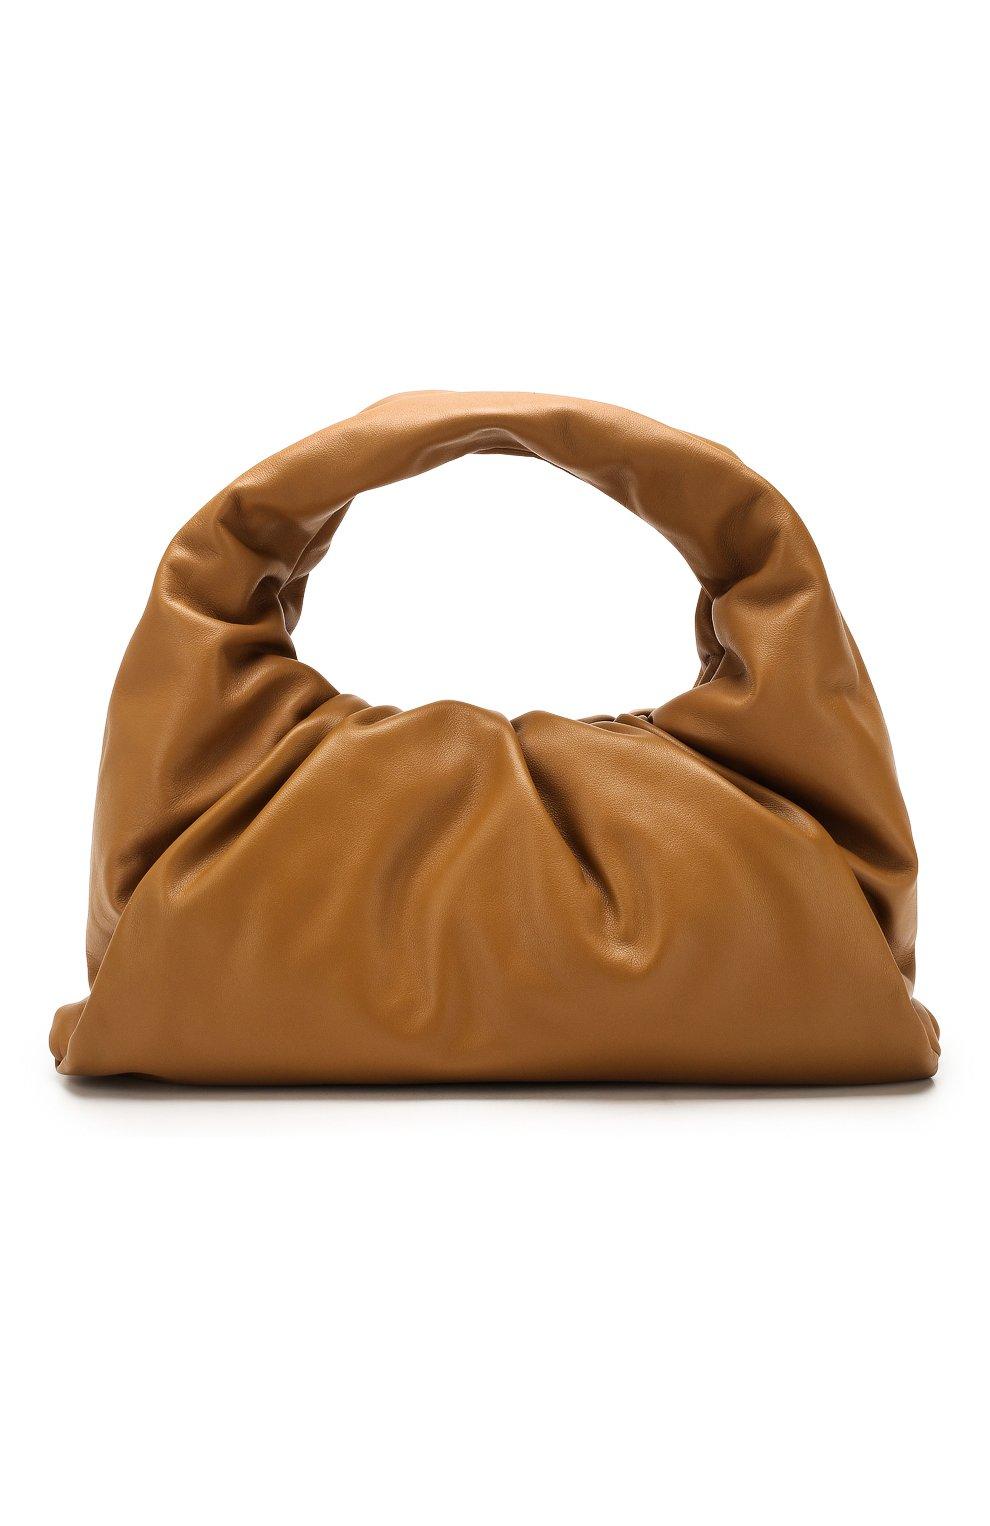 Женская сумка shoulder pouch BOTTEGA VENETA бежевого цвета, арт. 610524/VCP40   Фото 1